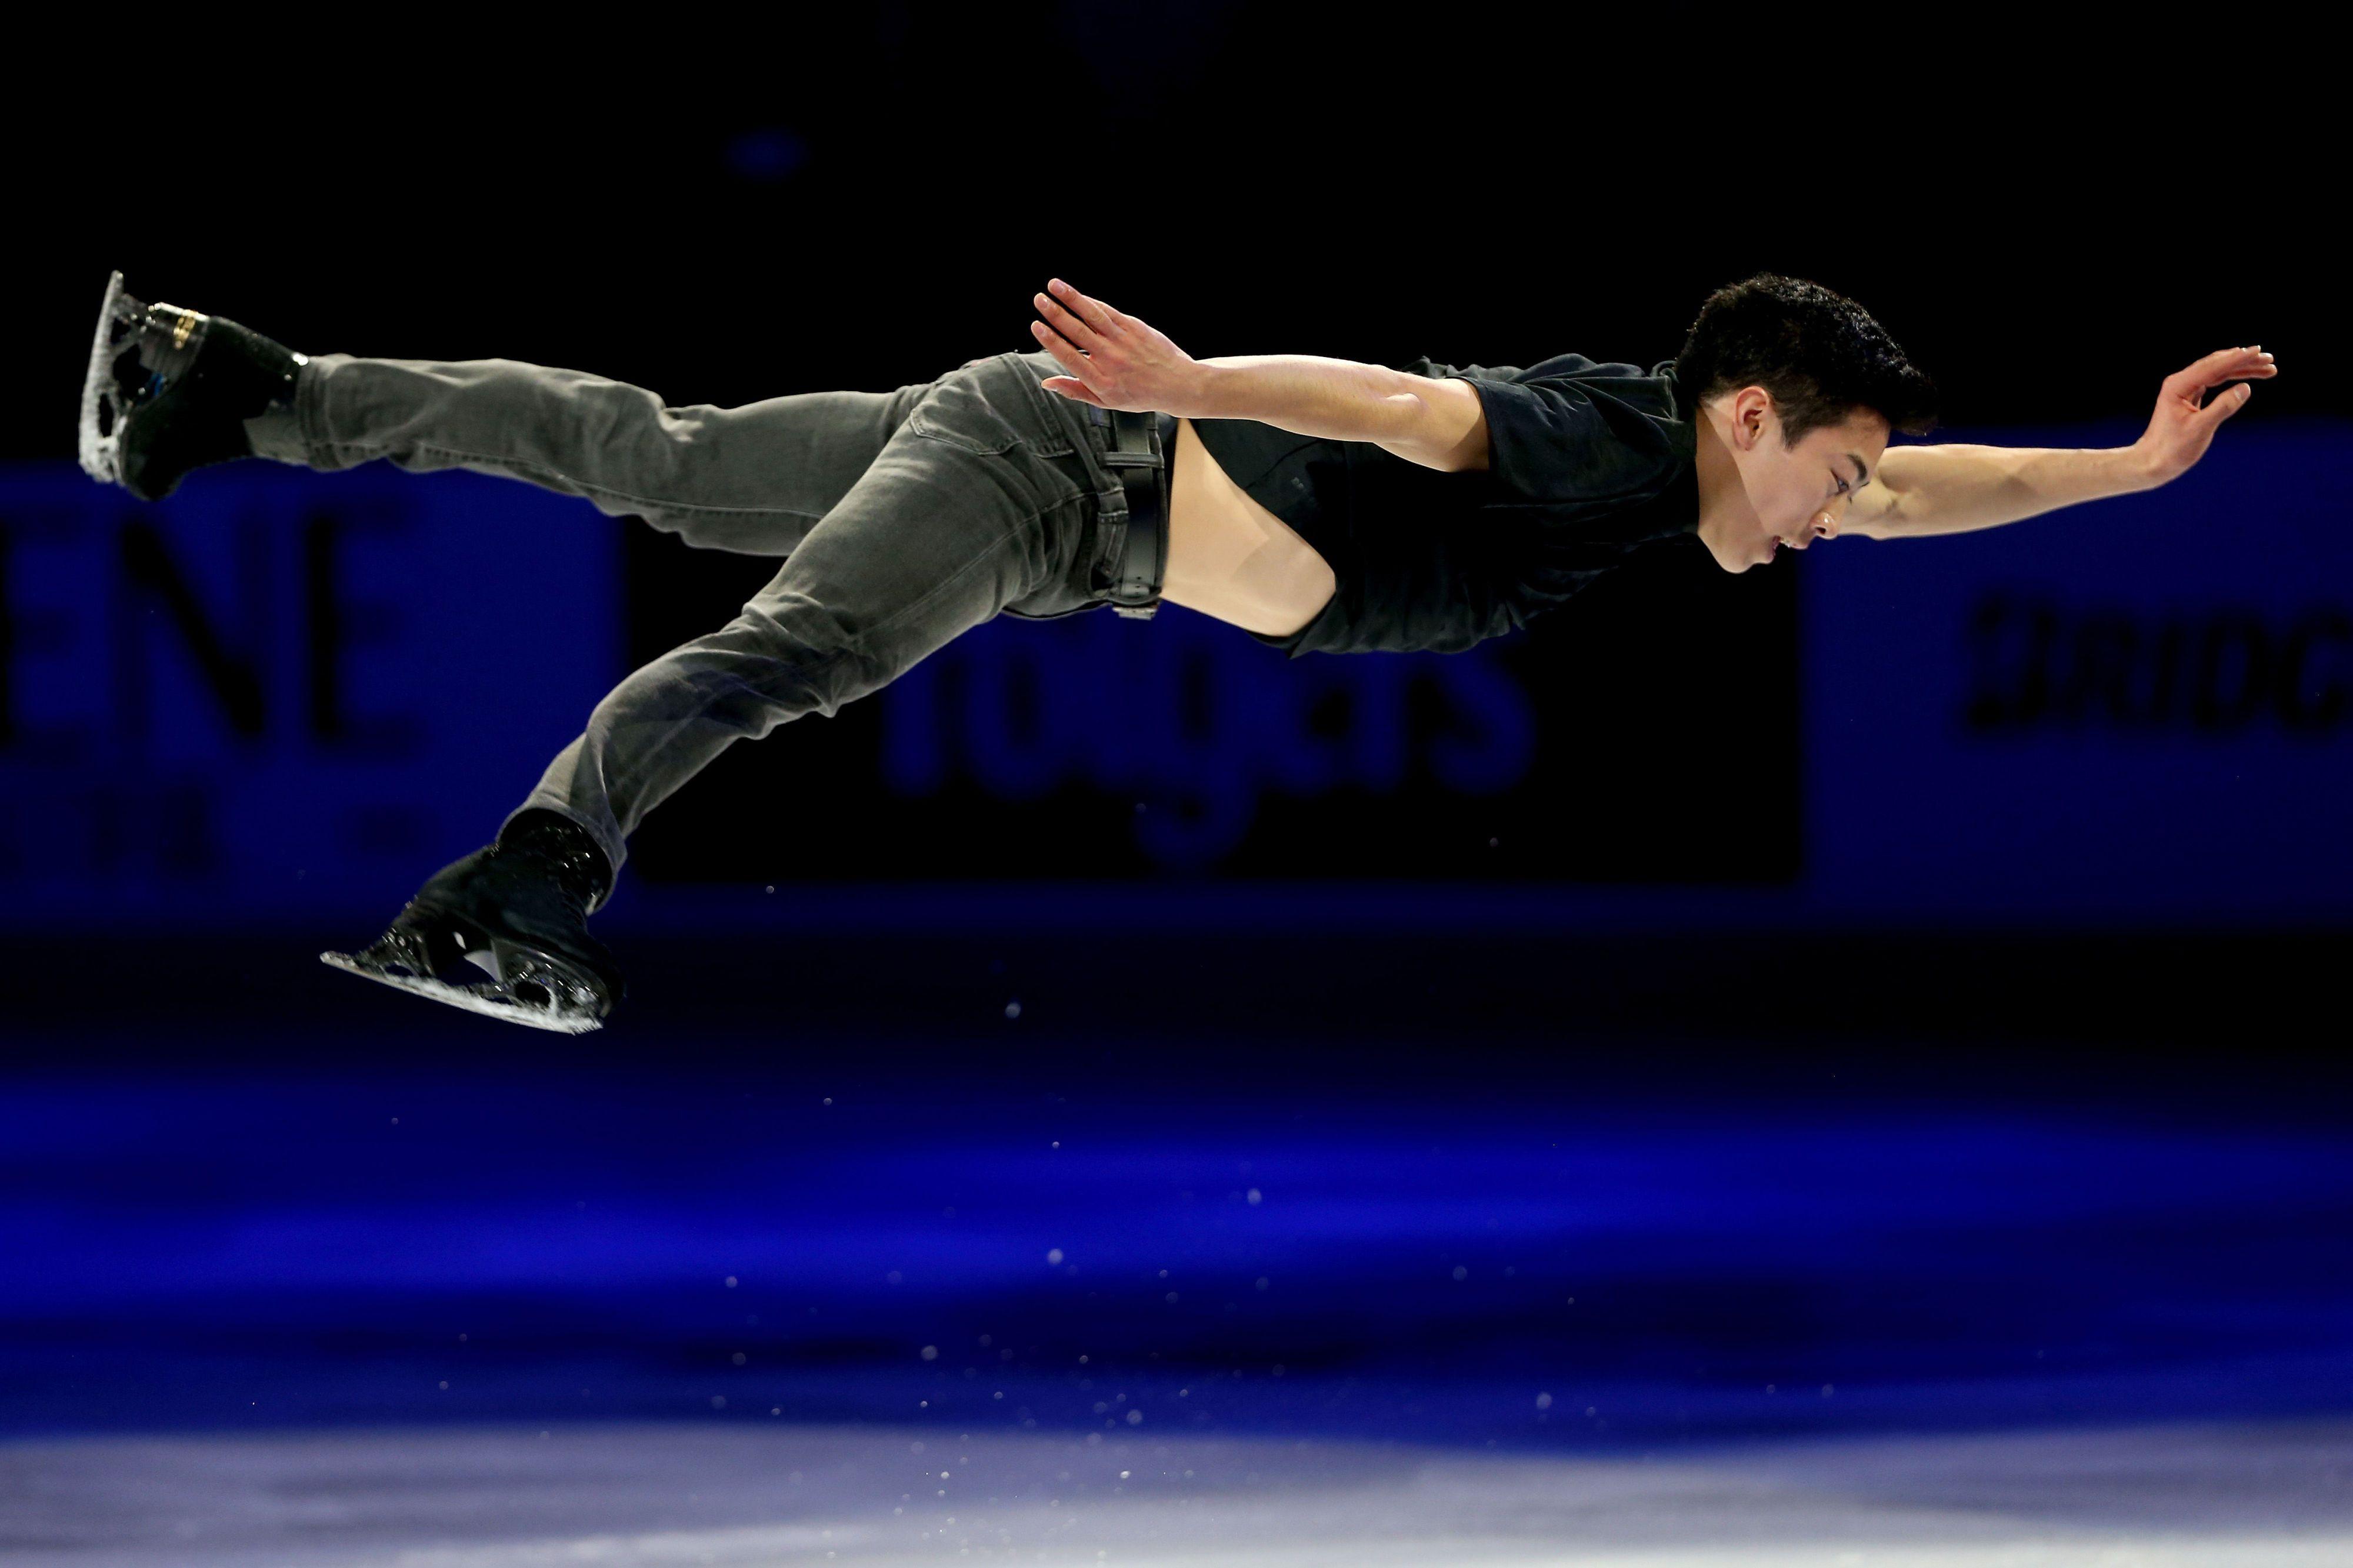 Skate canada nationals 2018 giveaways